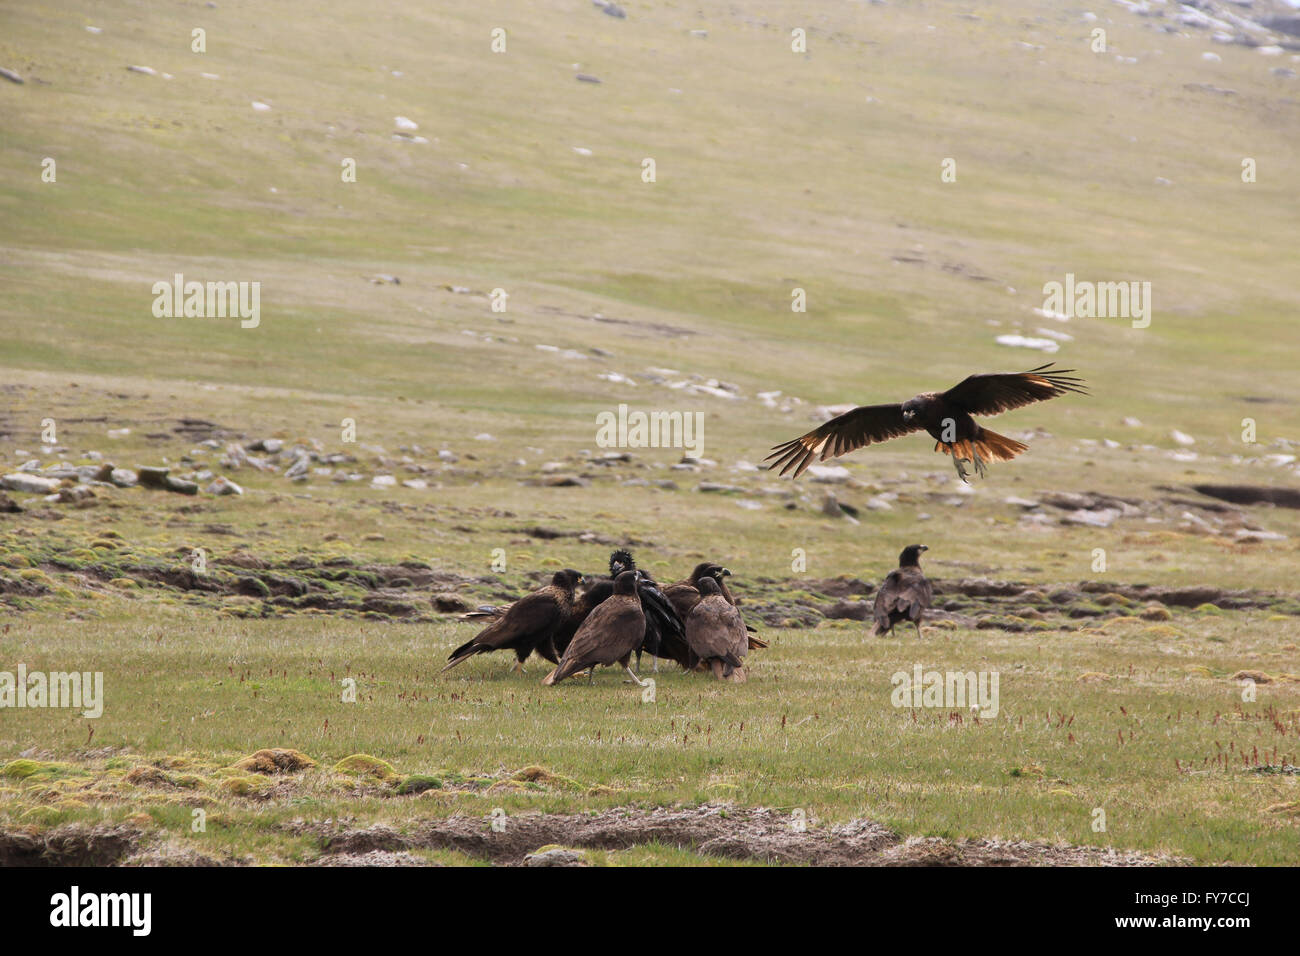 Striated caracara at West Point Island, Falkland Islands, South Atlantic Stock Photo